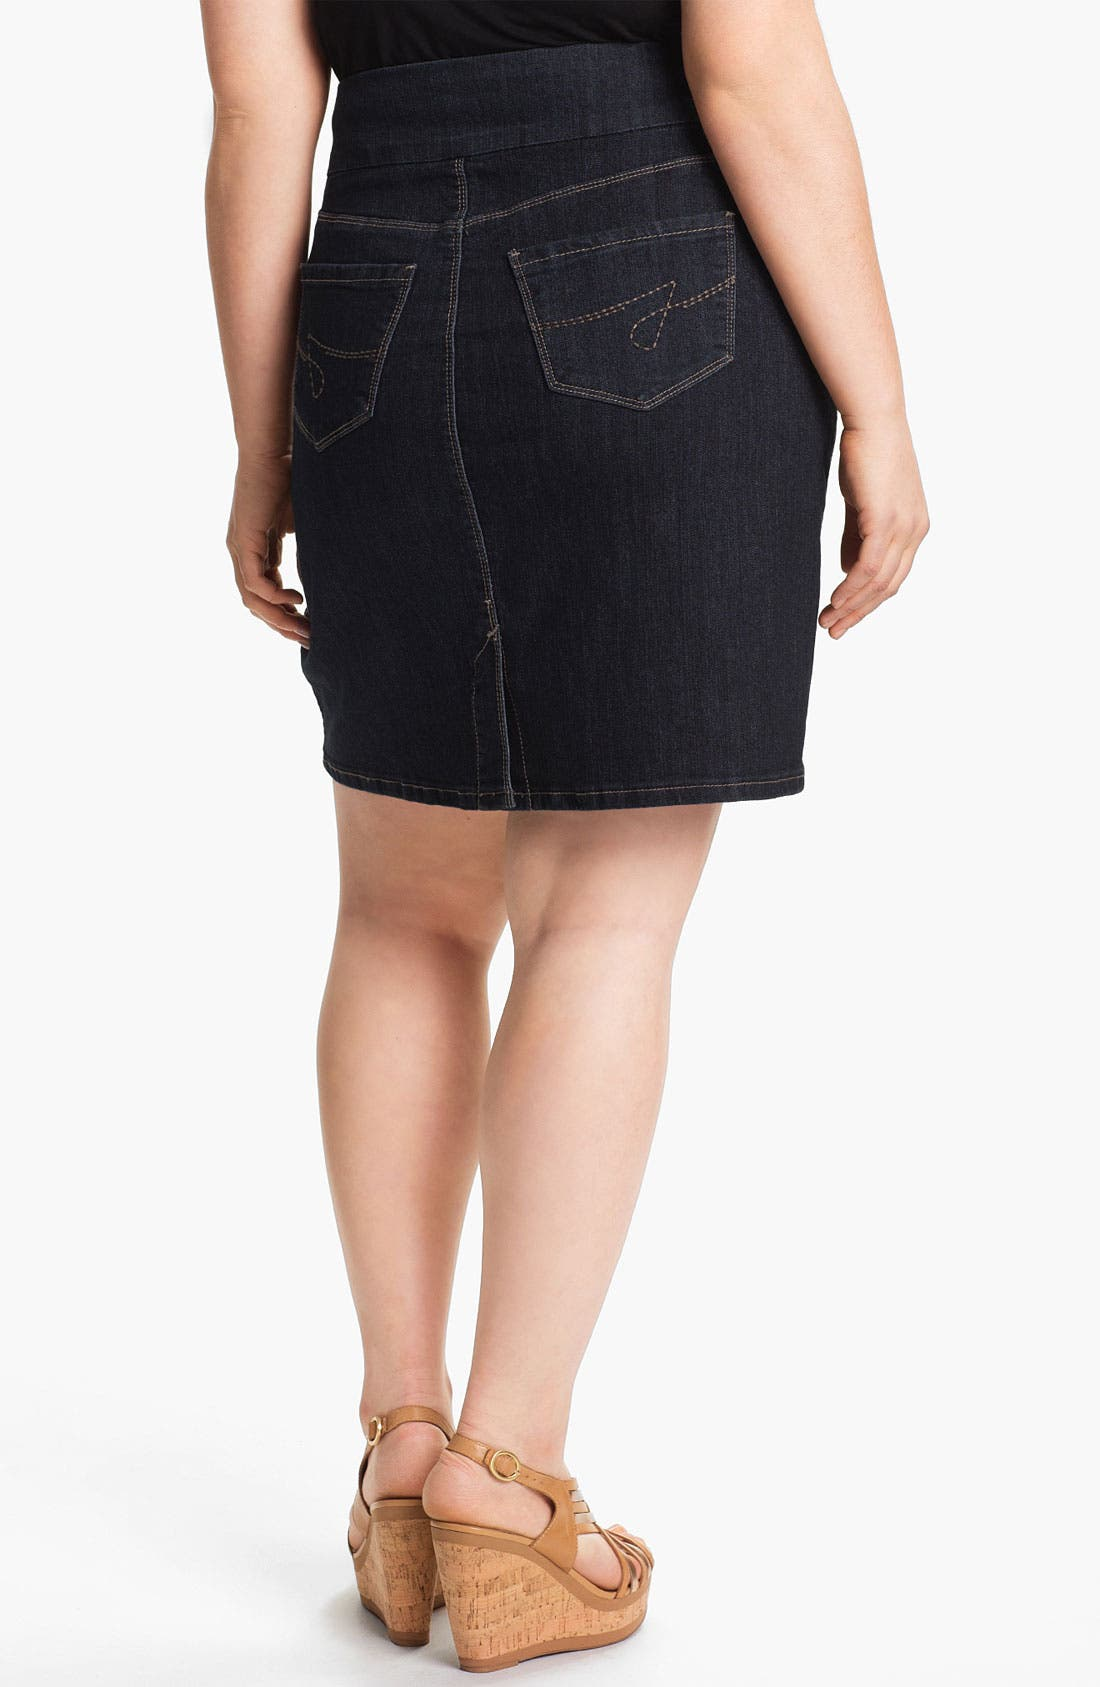 Alternate Image 2  - Jag Jeans 'Maddock' Denim Skirt (Plus Size) (Online Only)